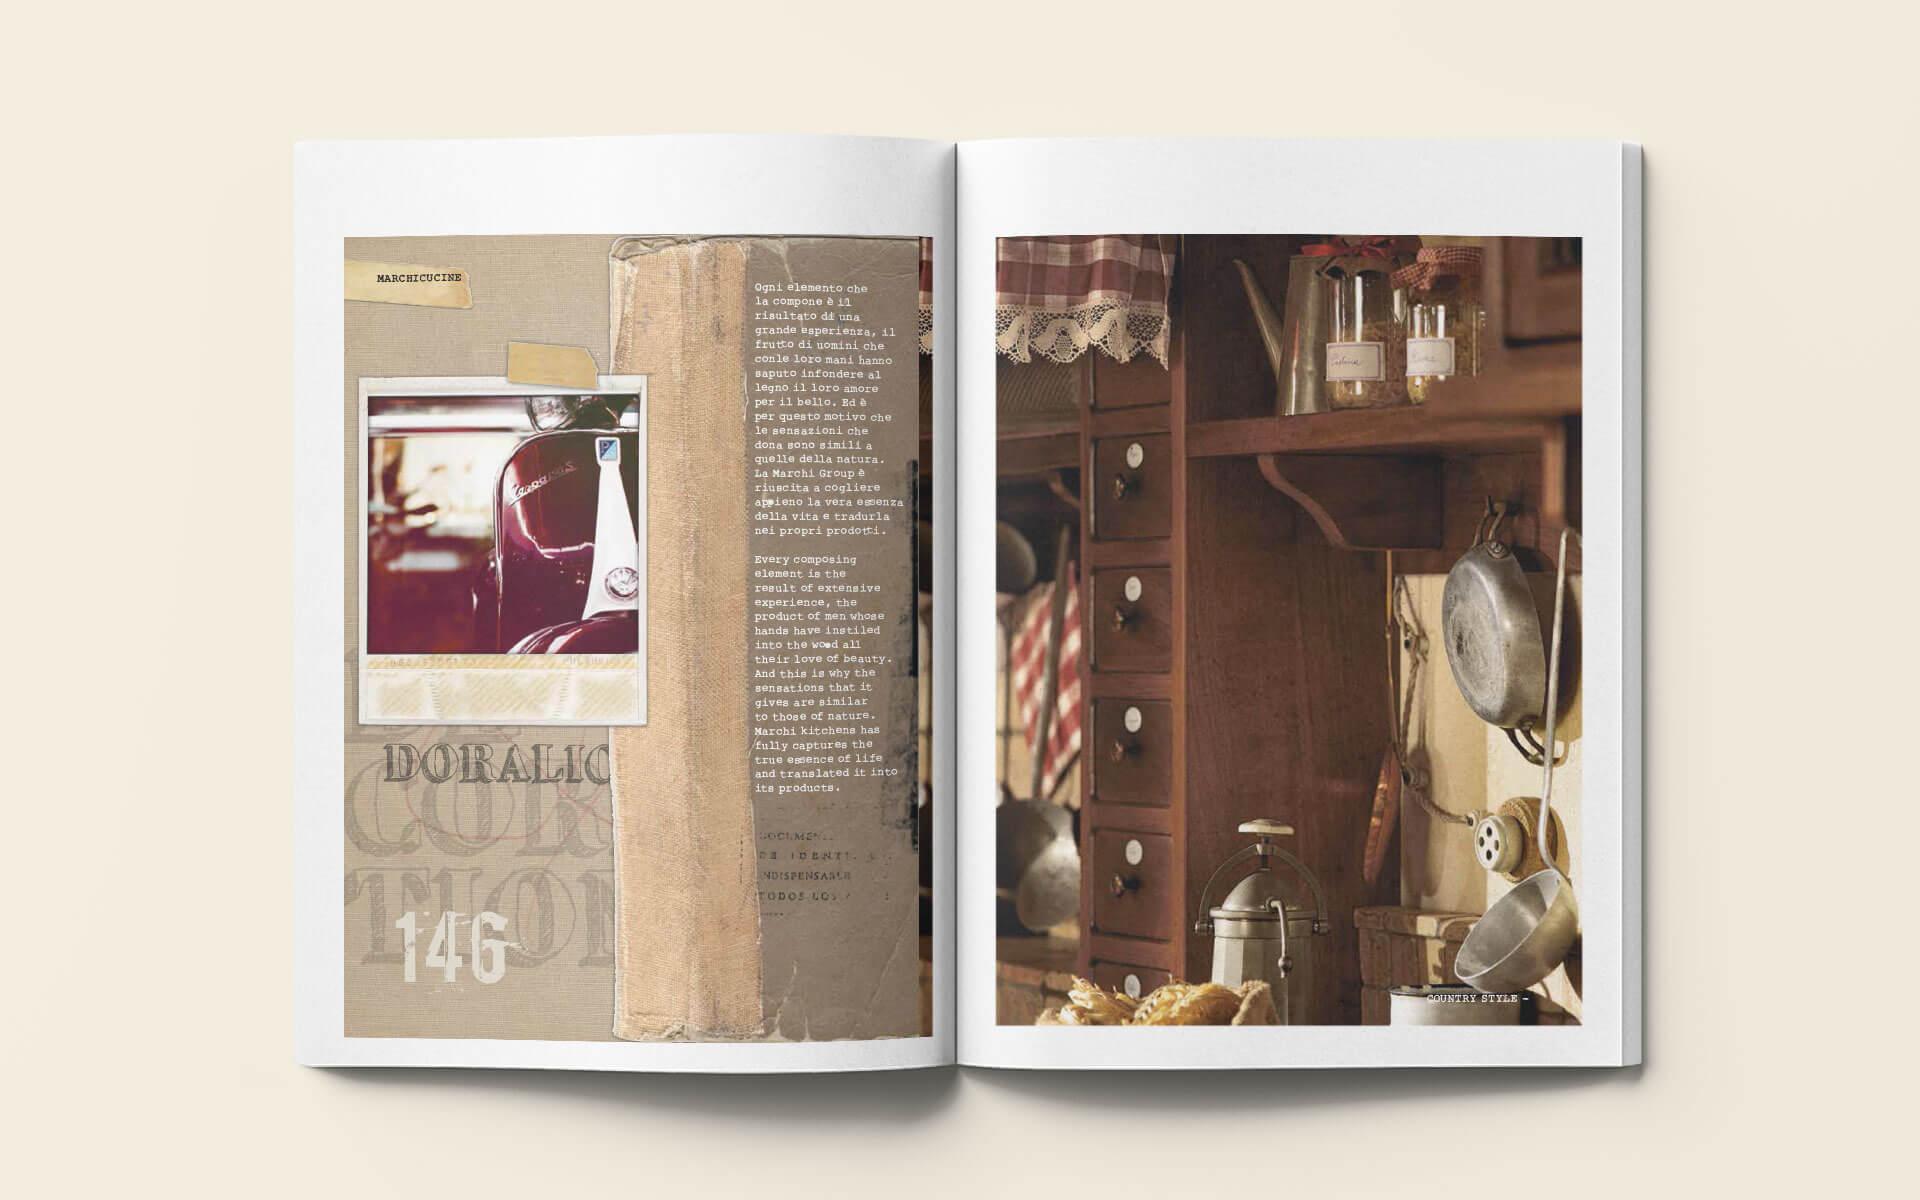 Catalogo Doralice - Marchi Cucine Made in Italy